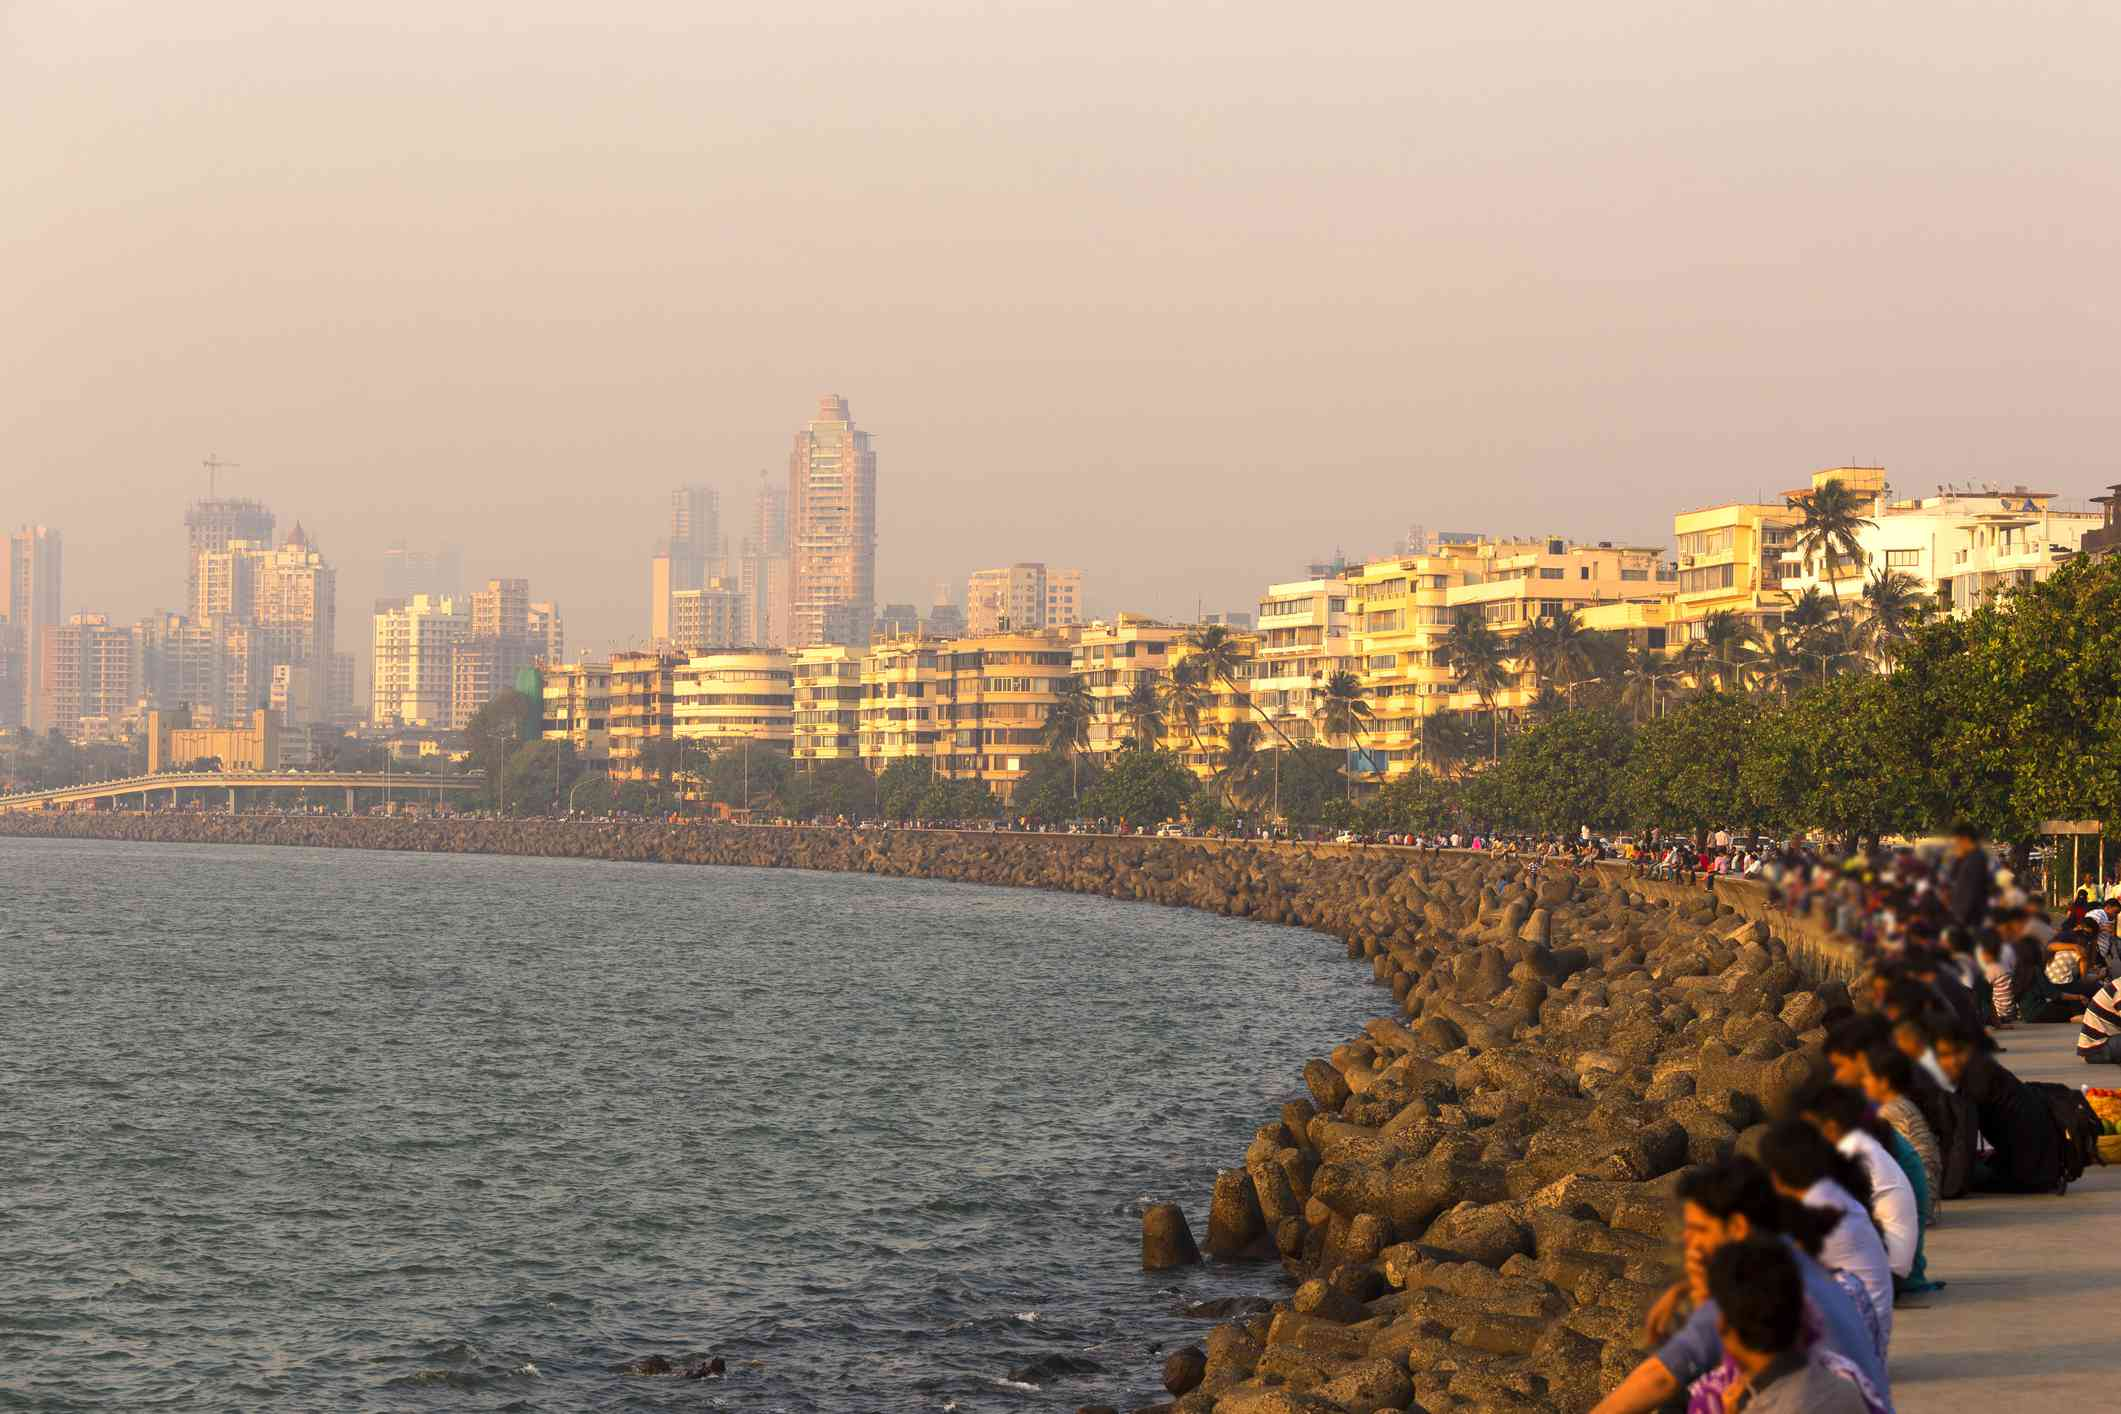 Sunset on Marine Drive, Mumbai